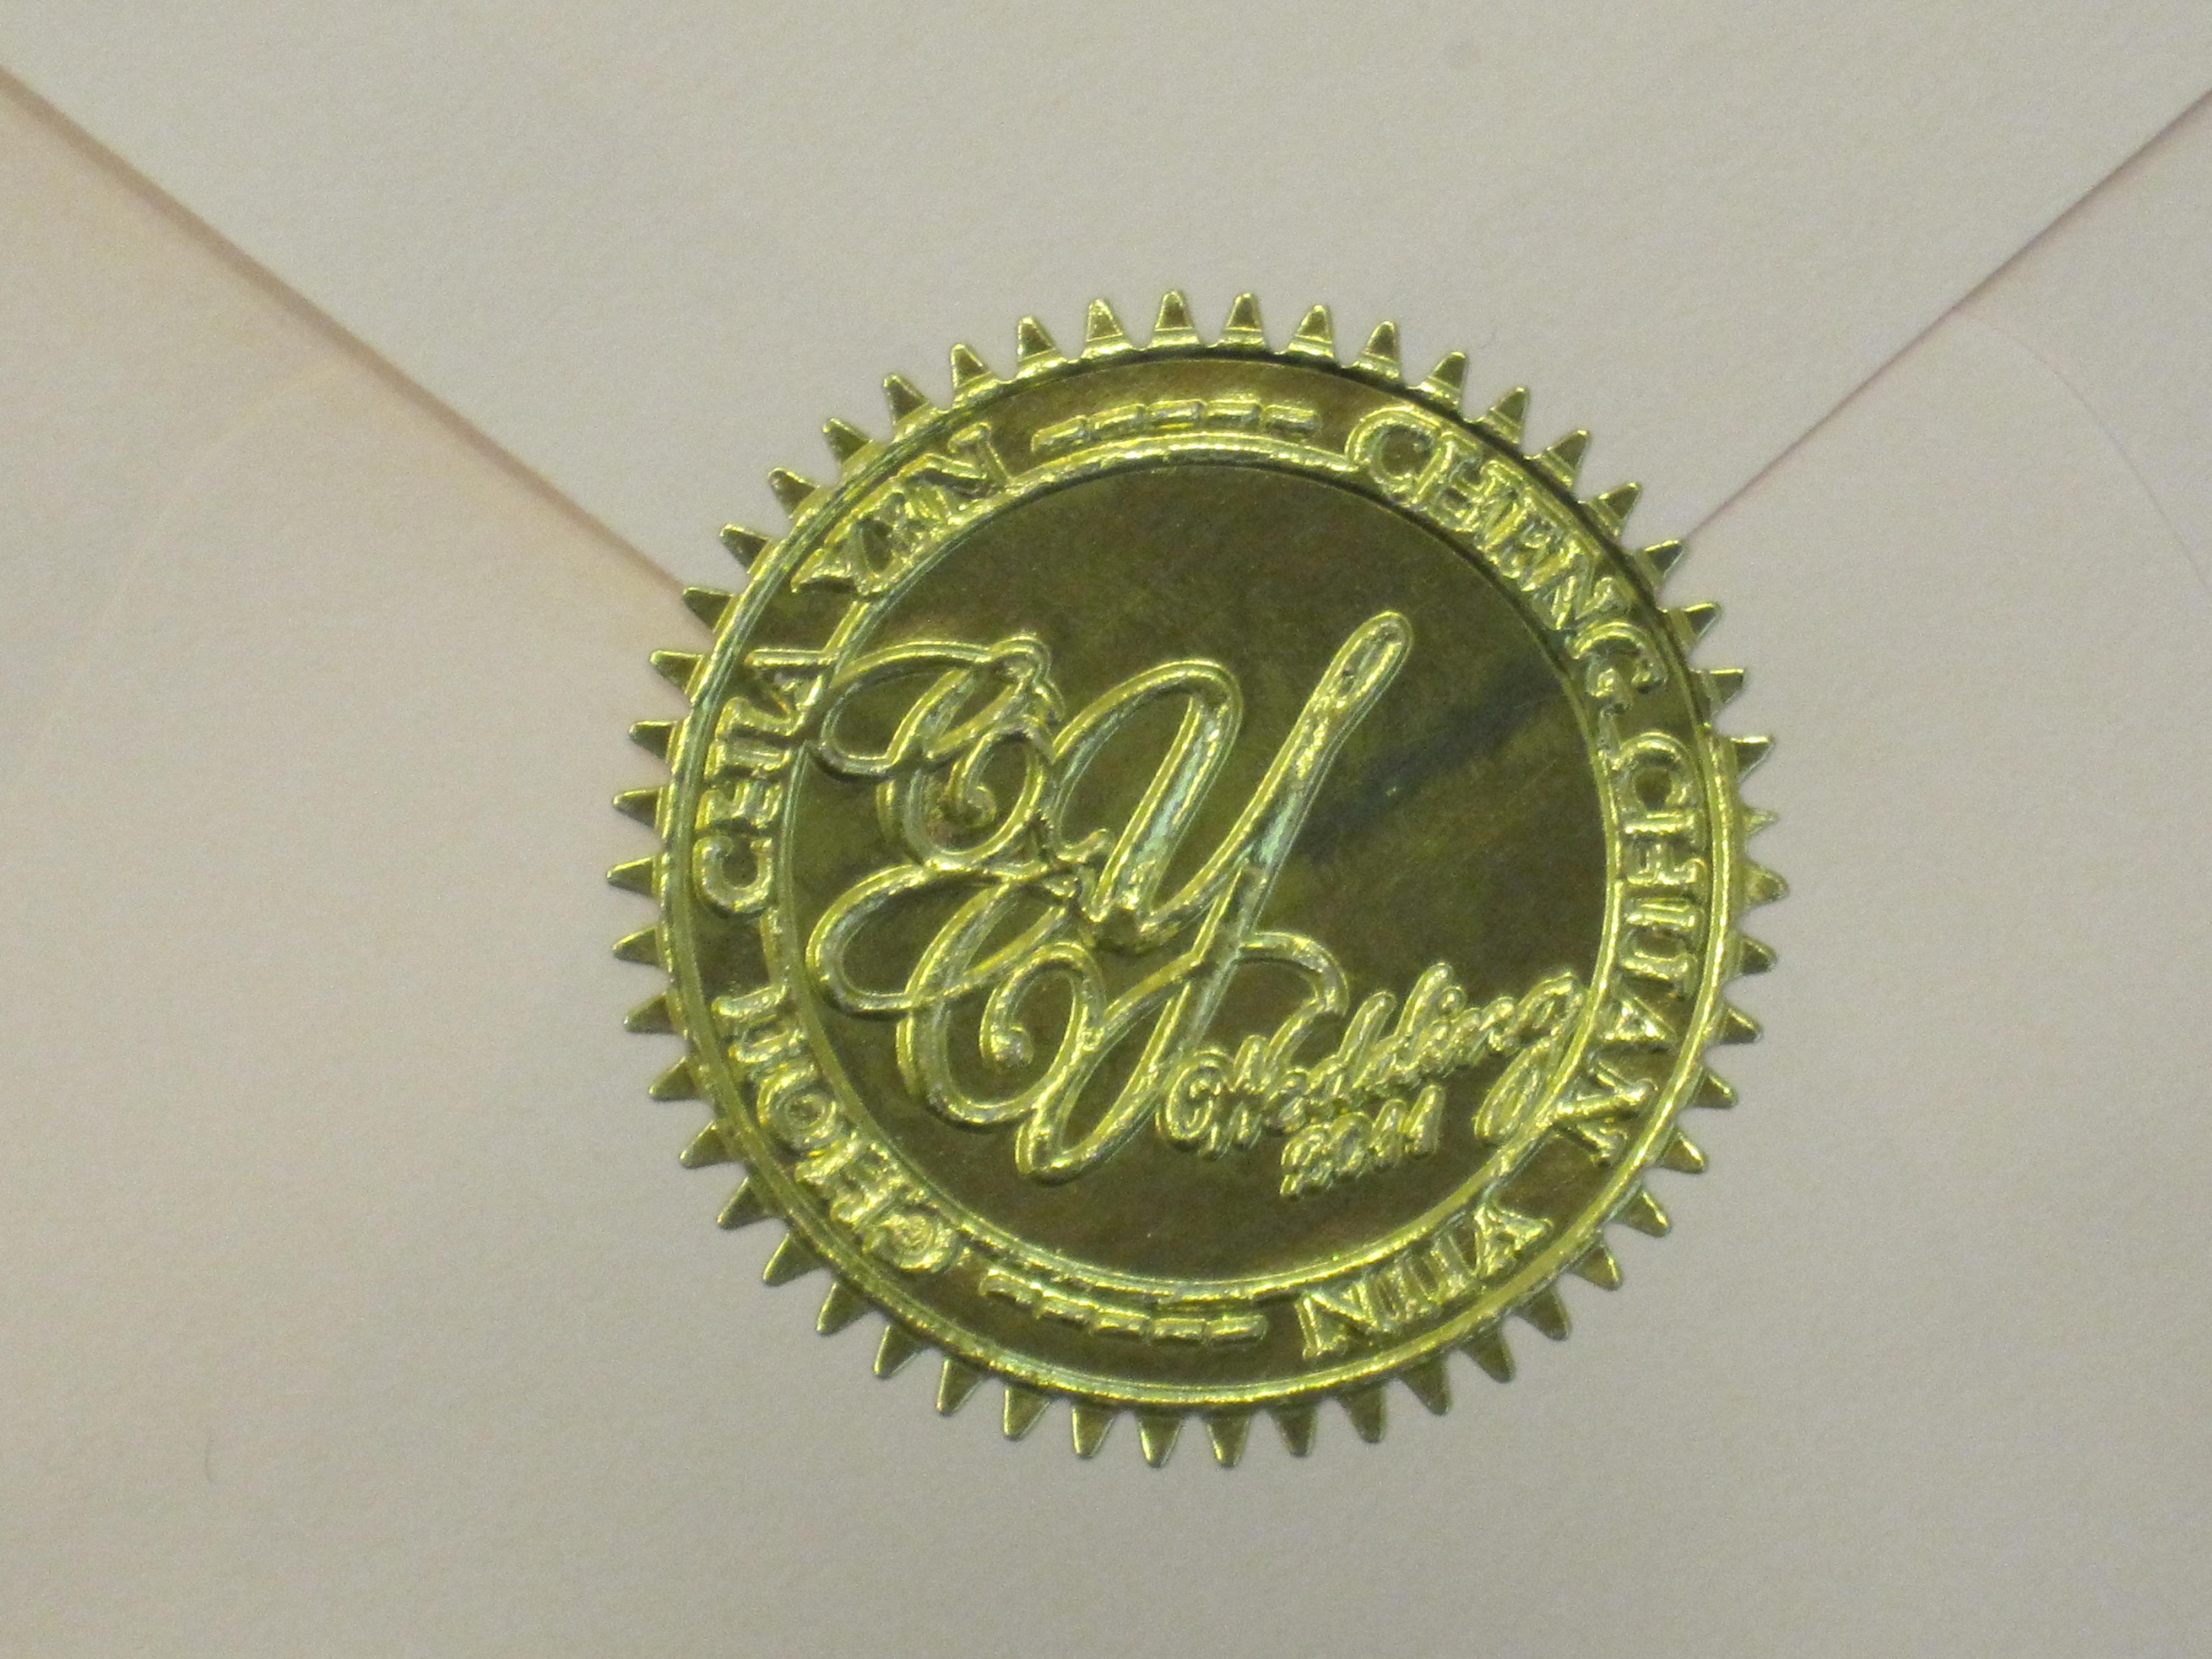 logo貼紙.JPG